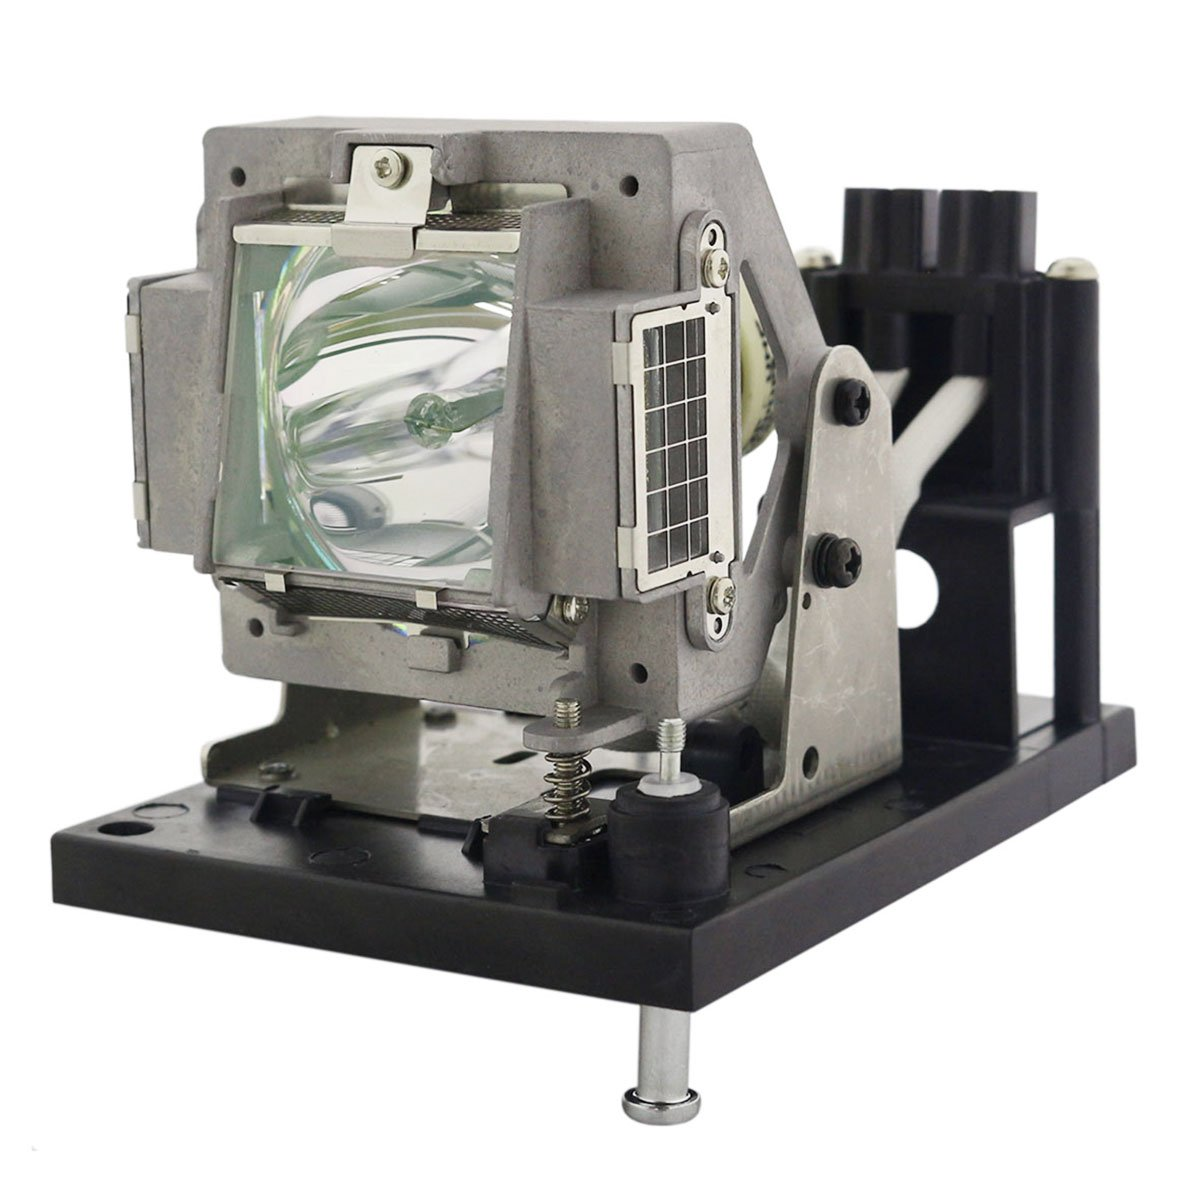 POA-LMP117/VPL1687 запасная прожекторная лампа с Корпус для Sanyo NEC NP4000 NP4001 PDG-DXT1000CL PDG-DWT50L PDG-DXT10L